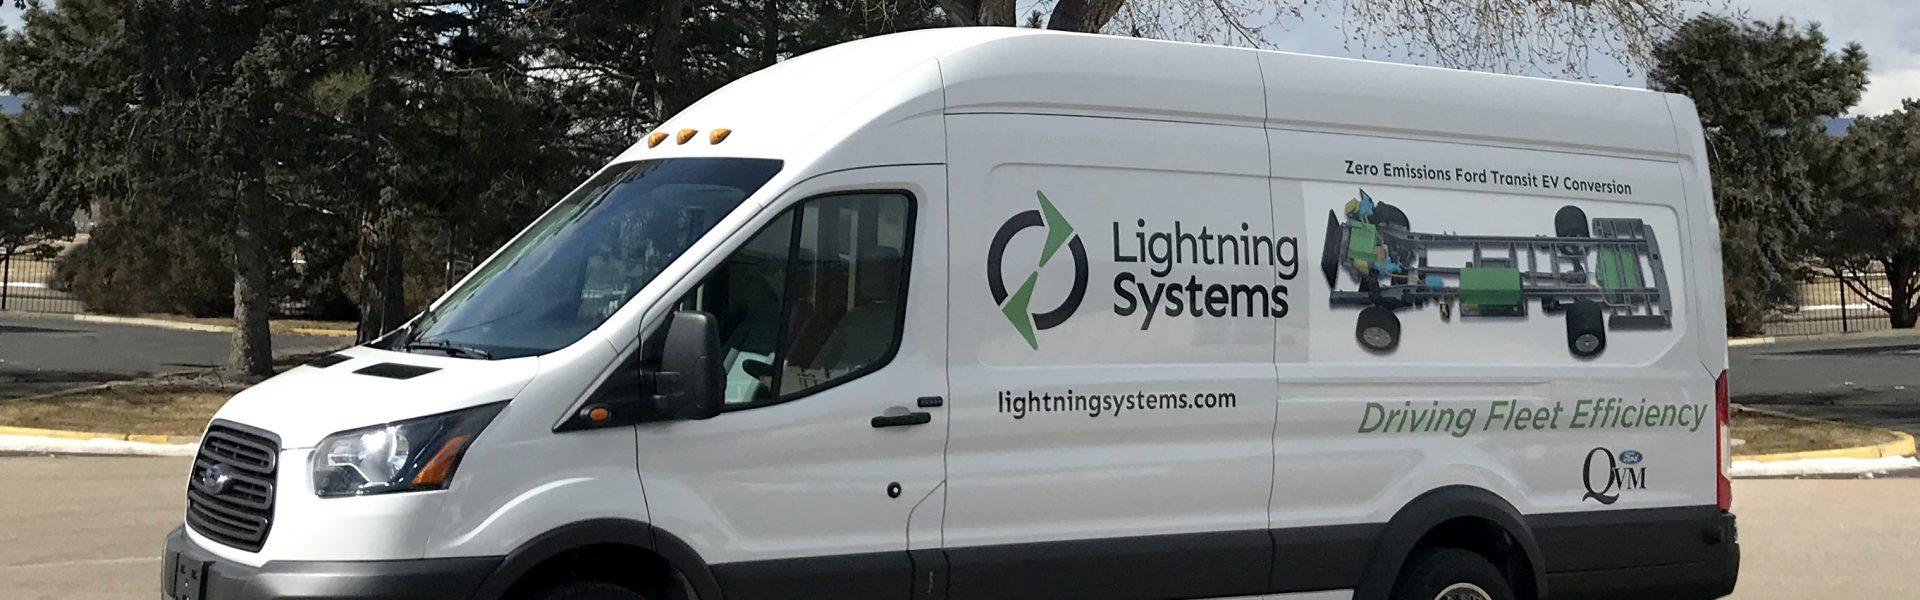 Lightning System Zero Emmisions